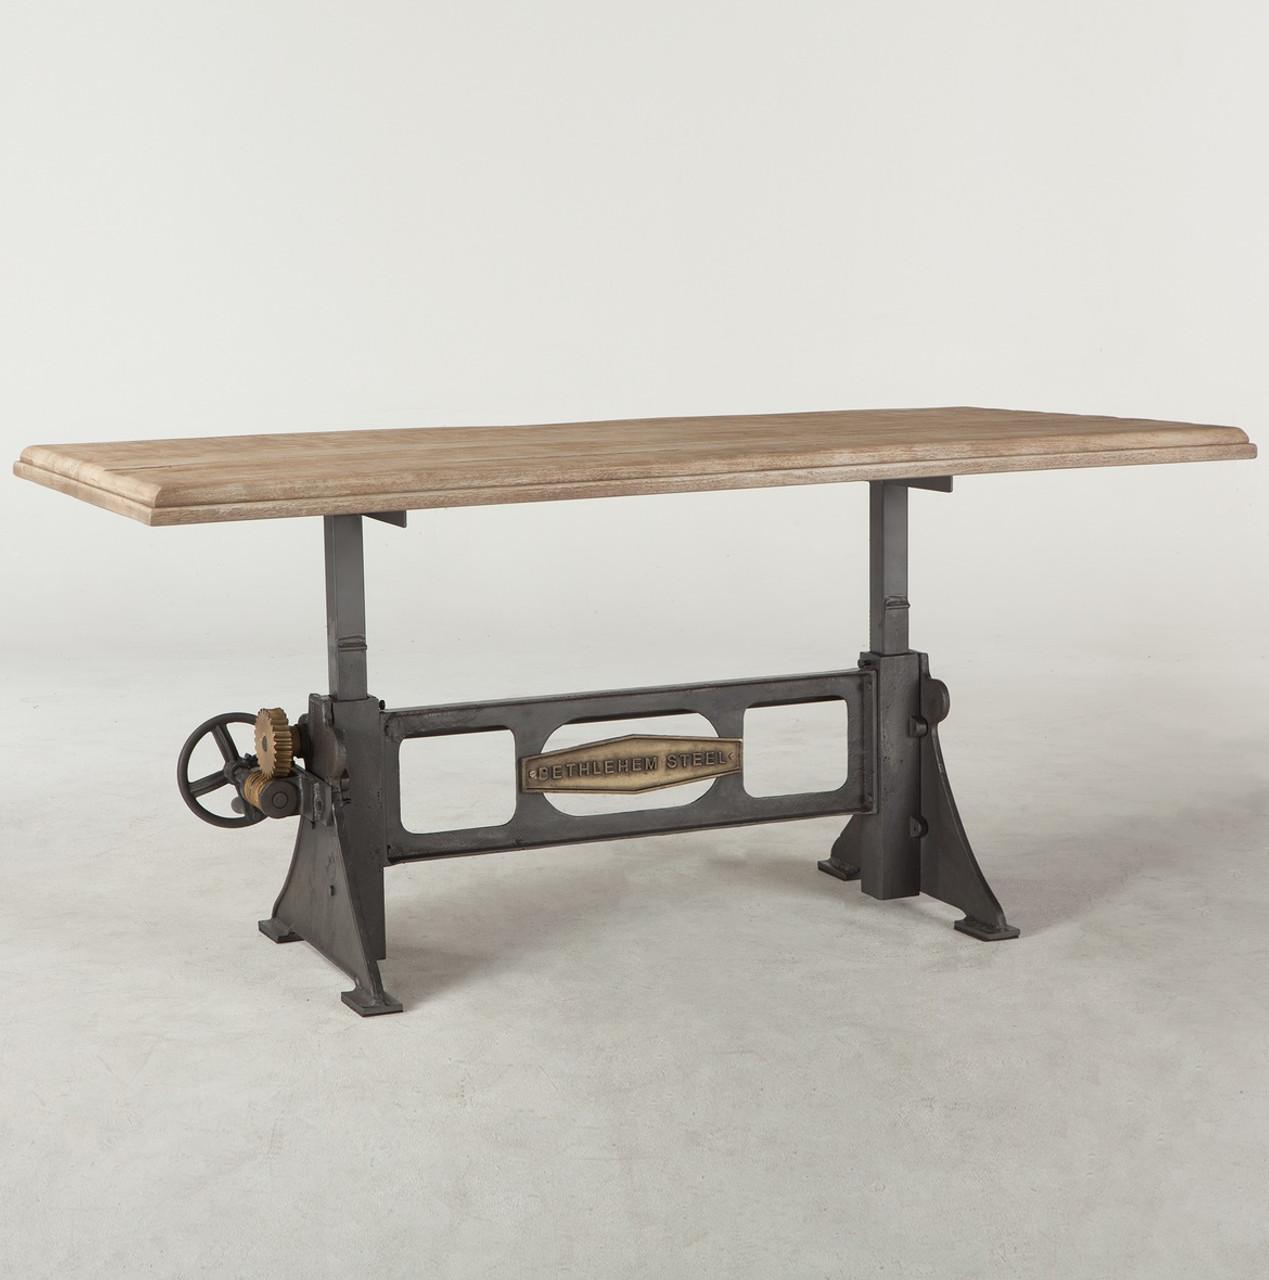 Steampunk Industrial Steel Wood Crank Dining Table 72 Zin Home